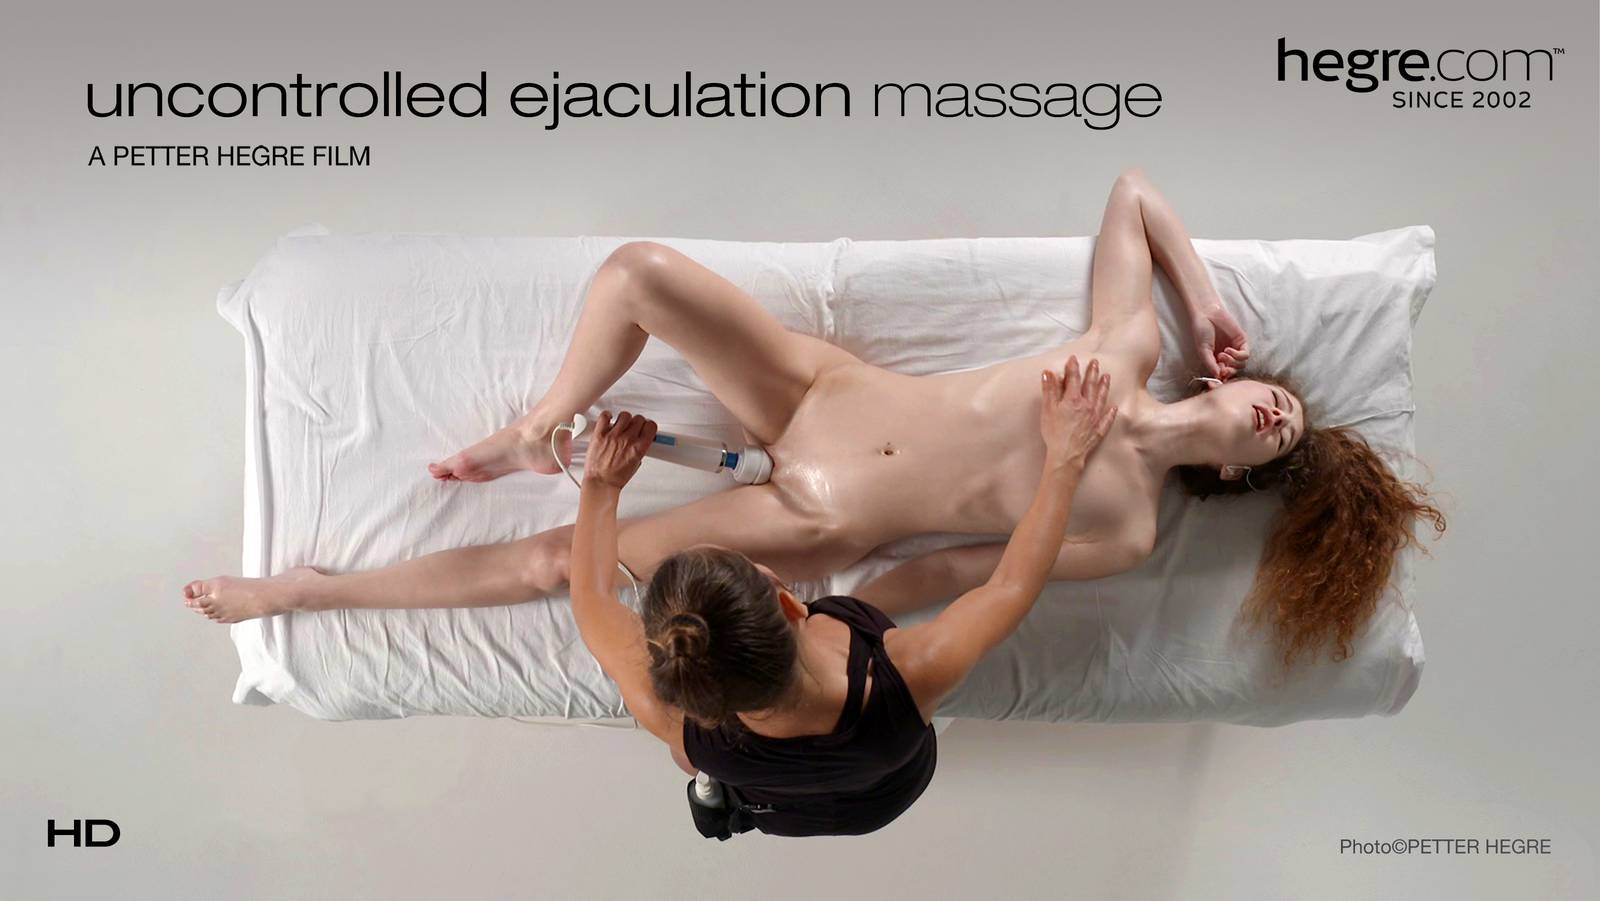 Ejac vaginale biz every horny amateur@todorazor.com